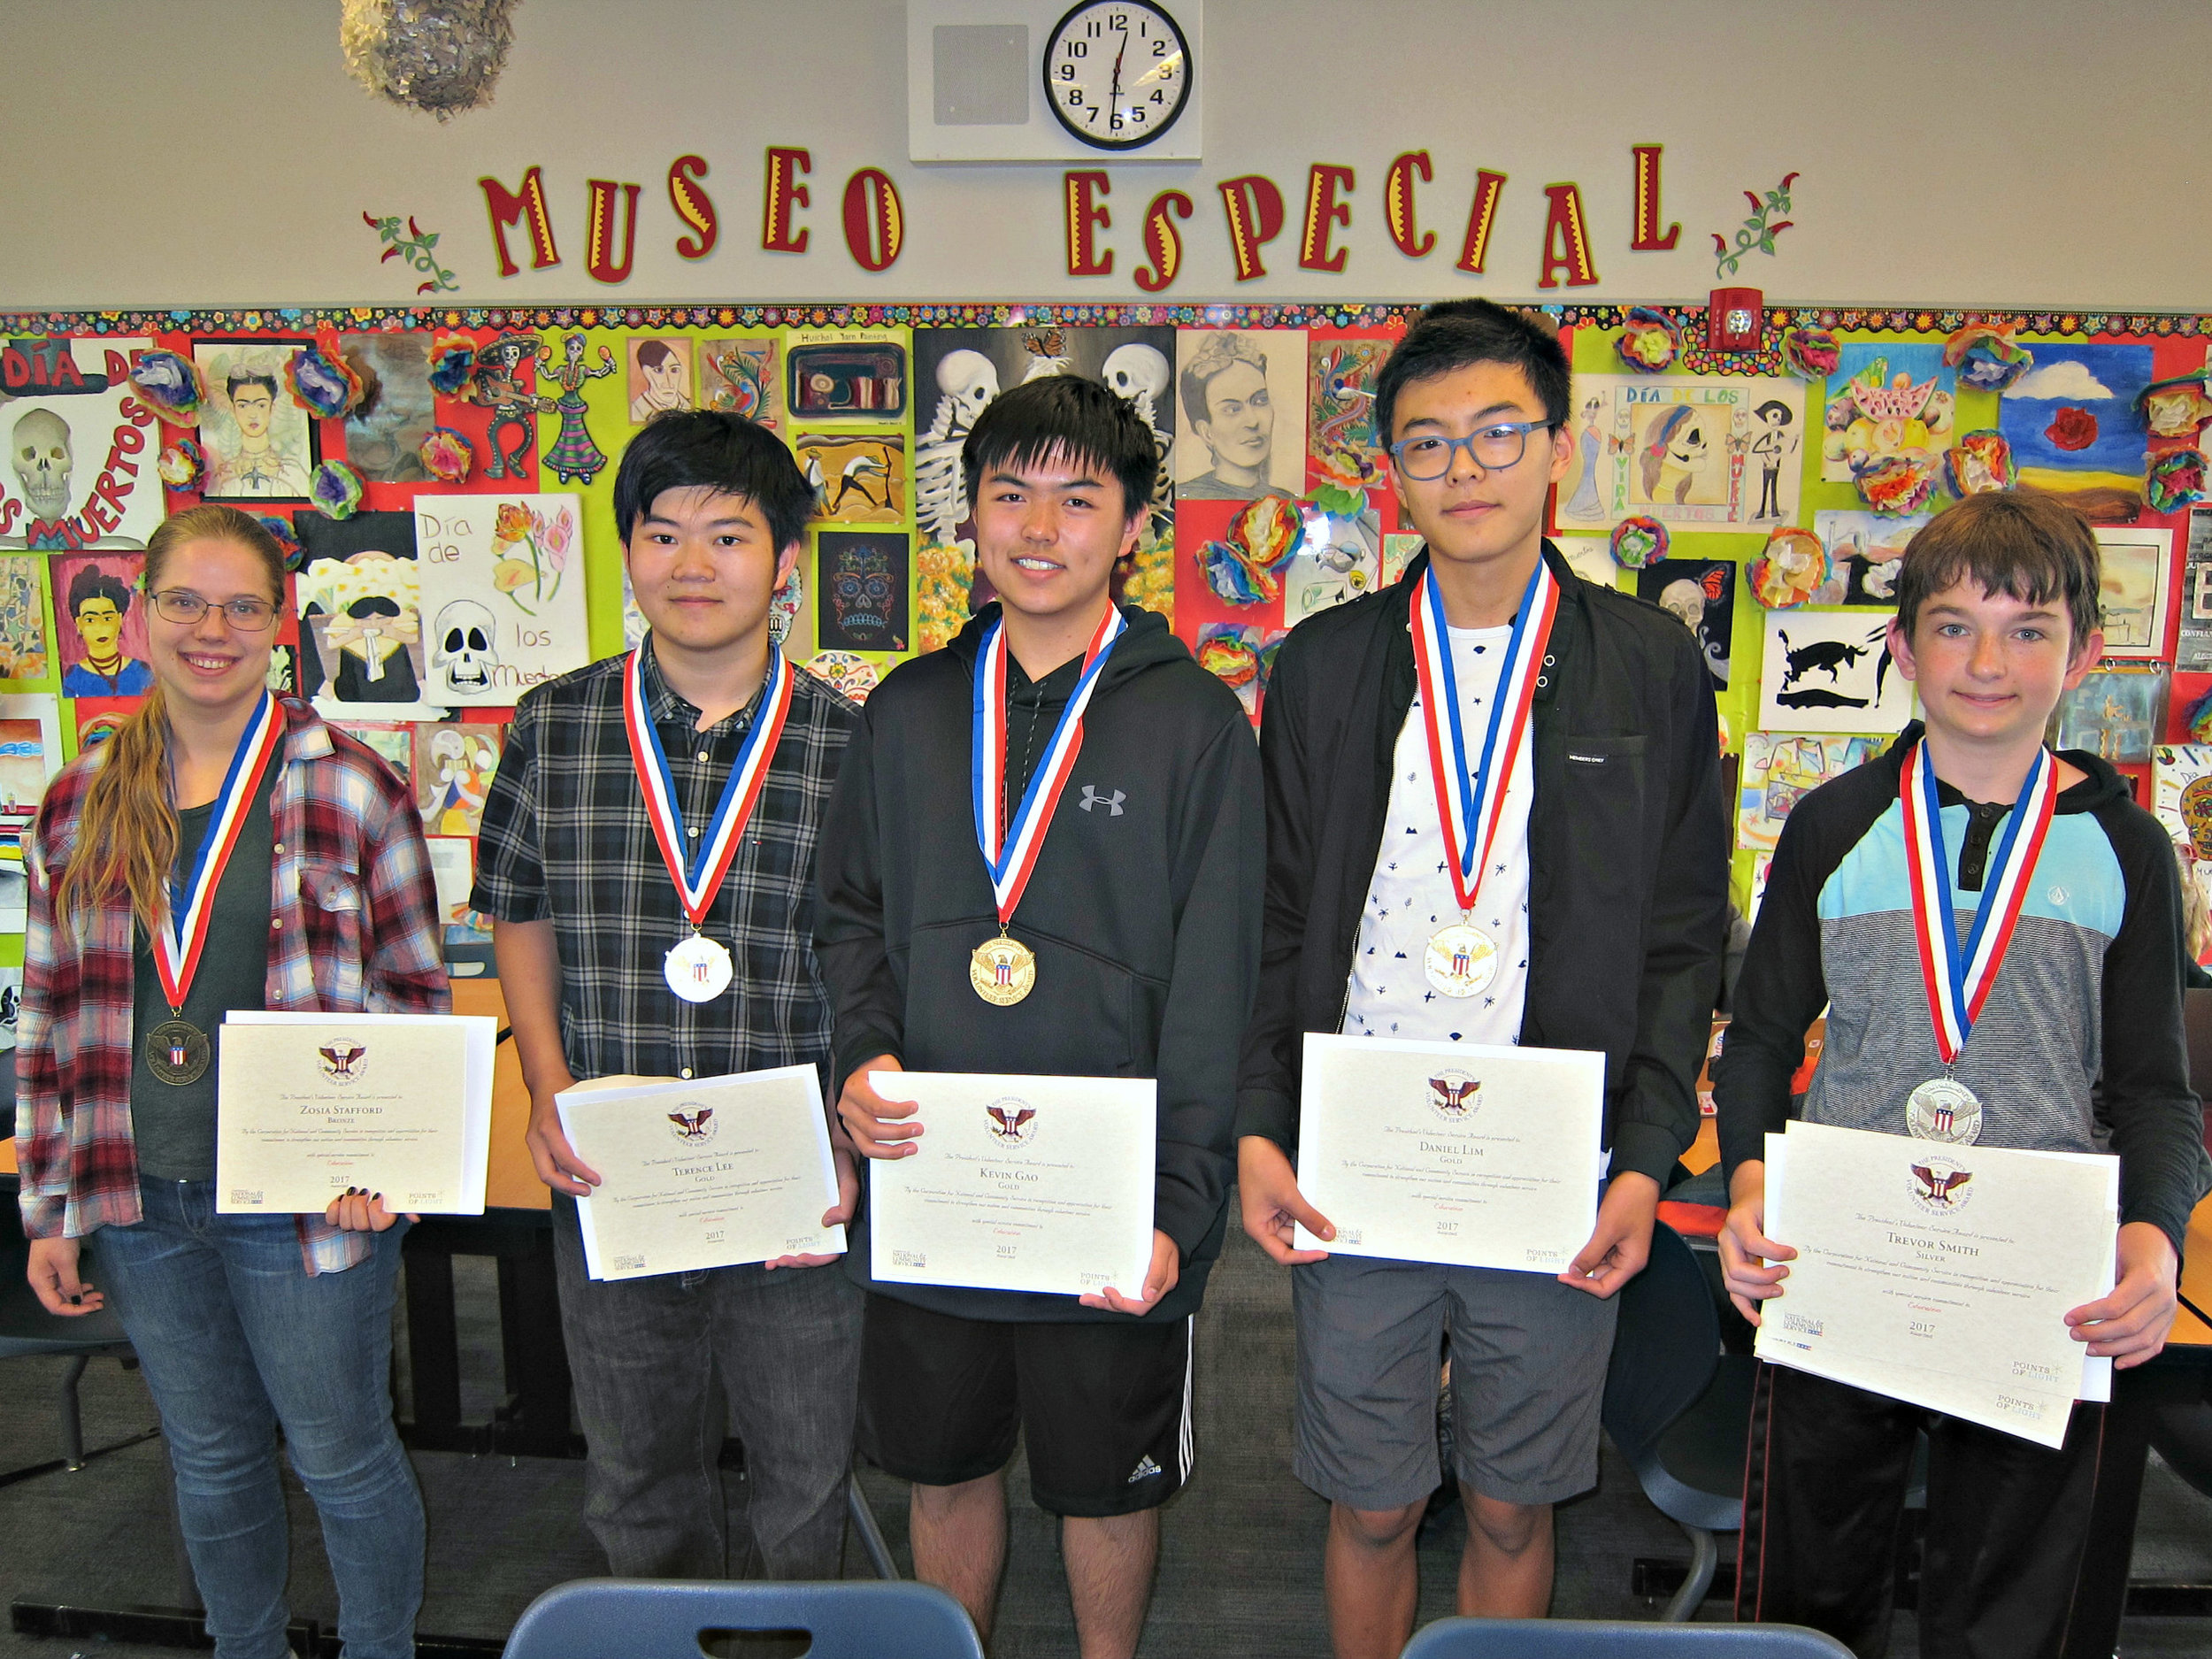 2017 President's Volunteer Service Award Winners